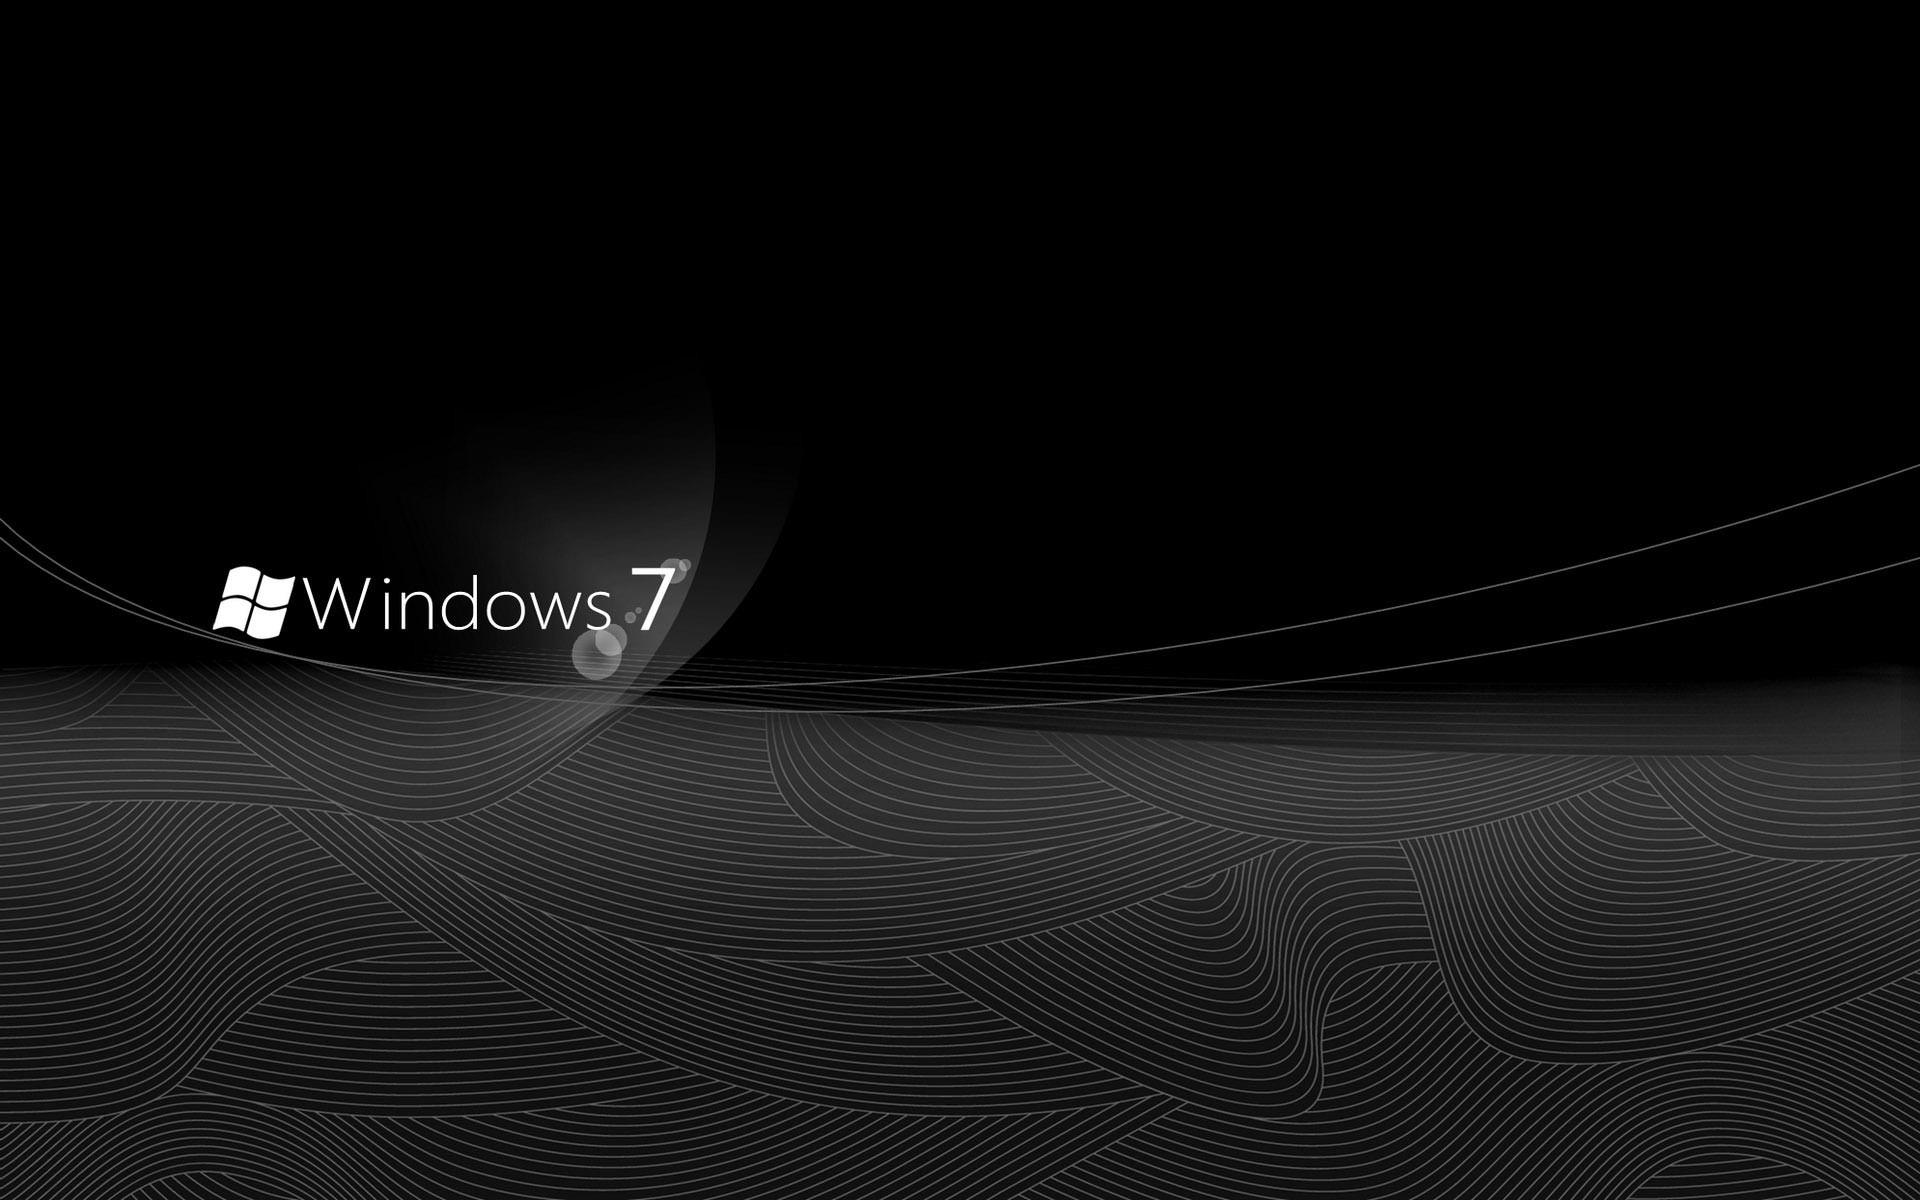 Res: 1920x1200, Windows 7 elegant black desktop wallpaper high quality wallpapers